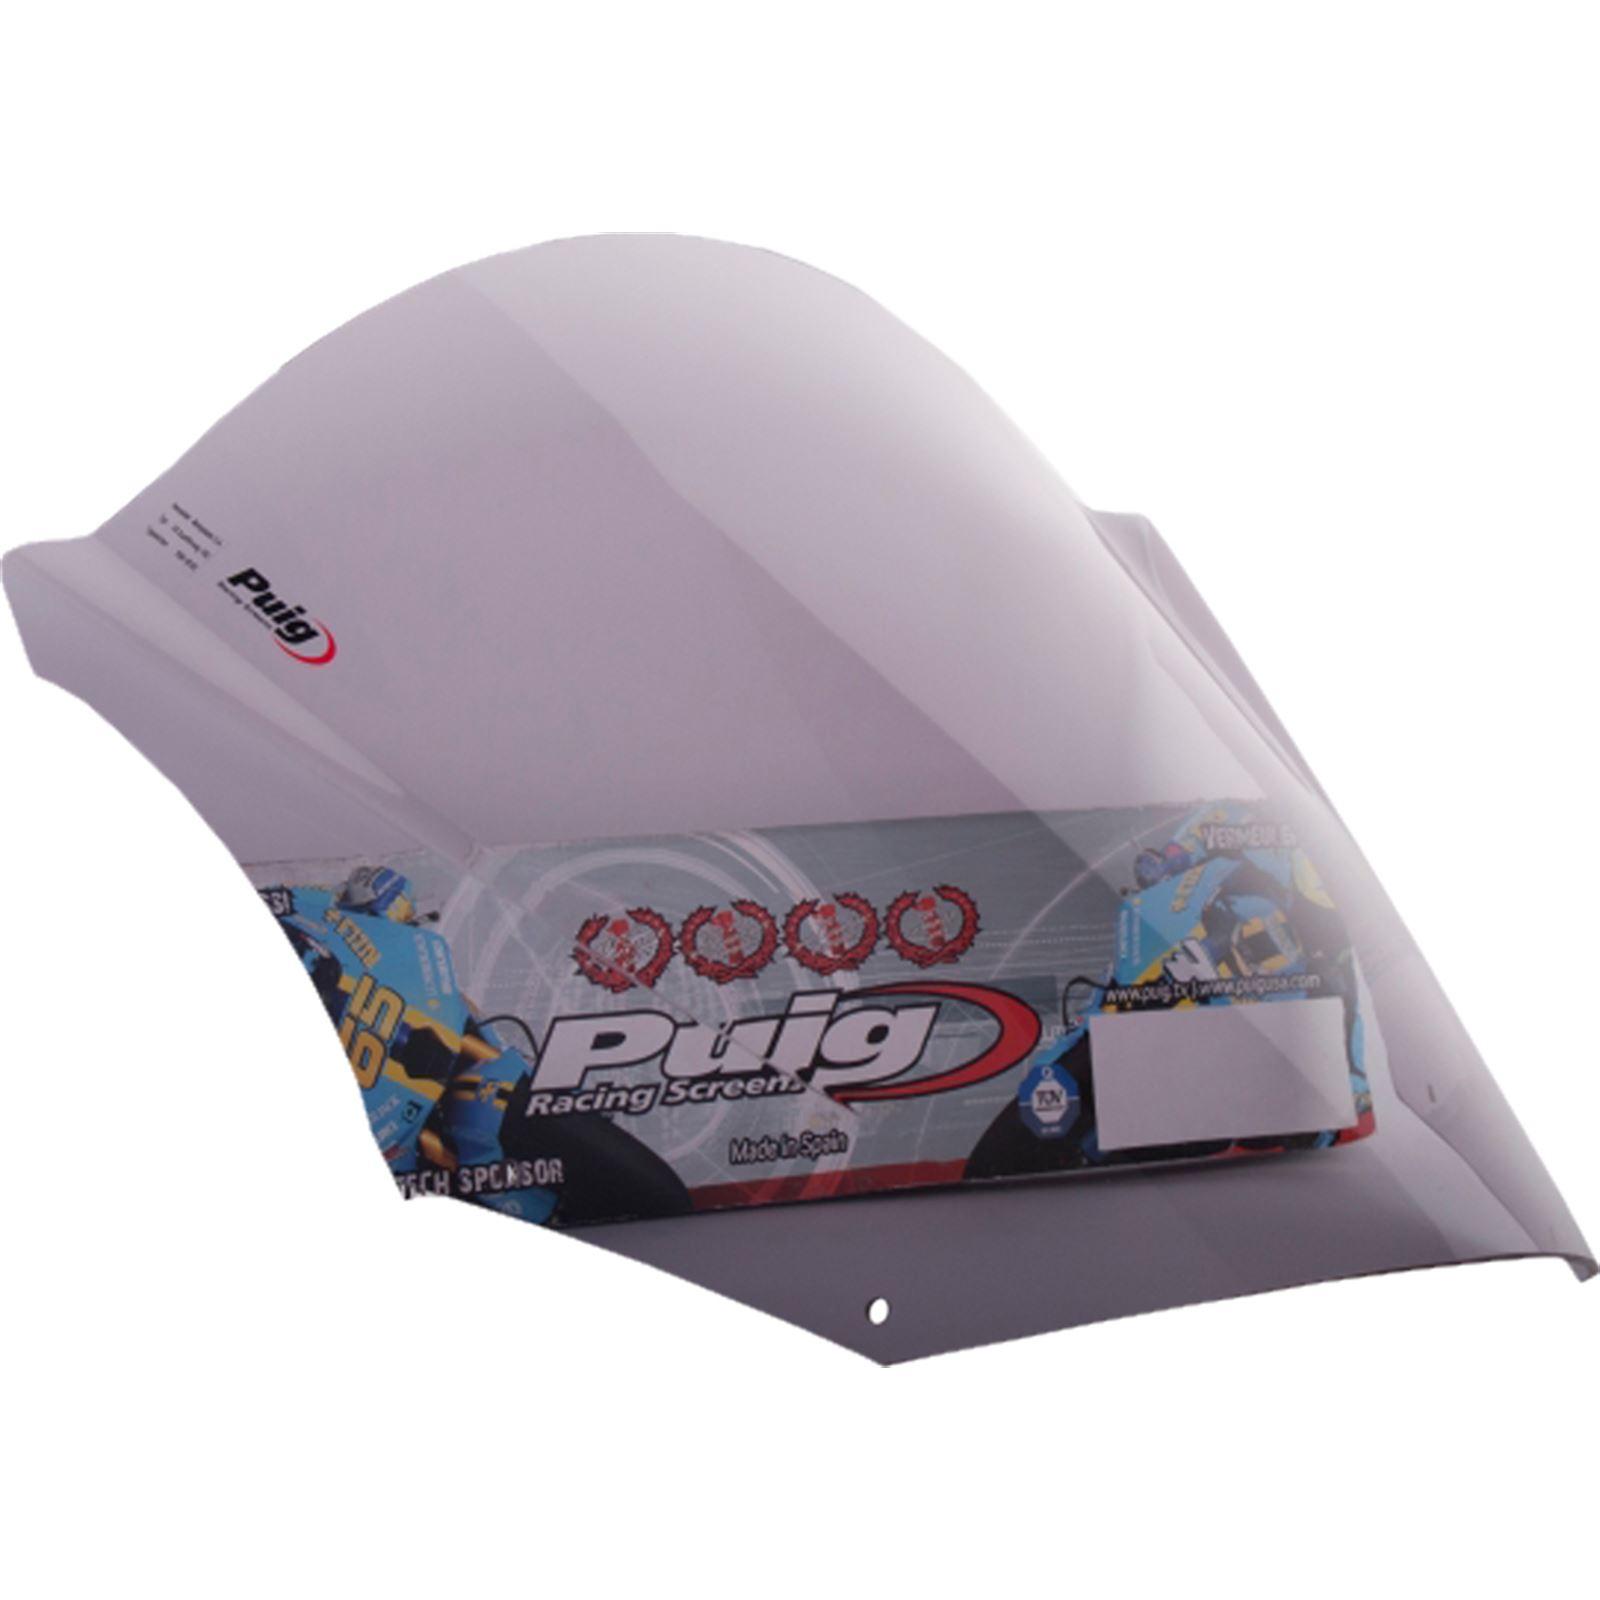 Puig Racing Windscreen